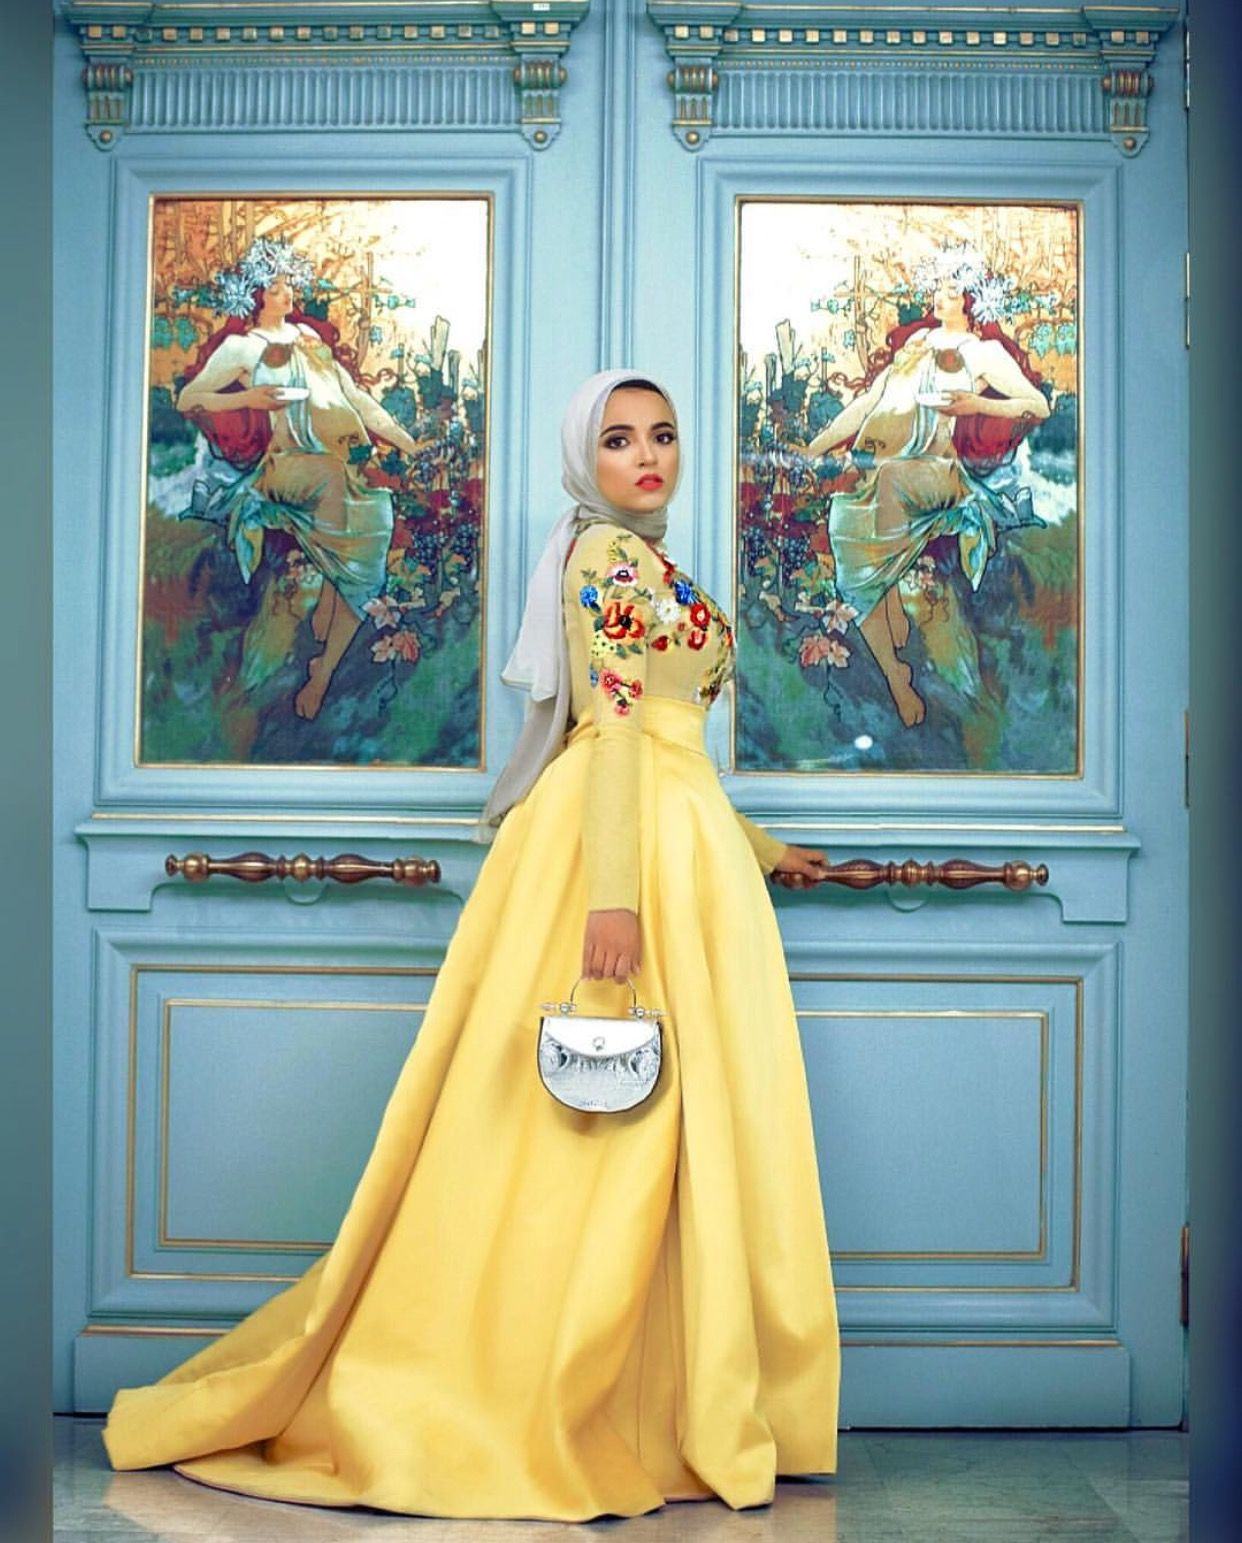 Pin by 🌸just4girls🌸 on Dresses | Pinterest | Hijab dress, Muslim ...